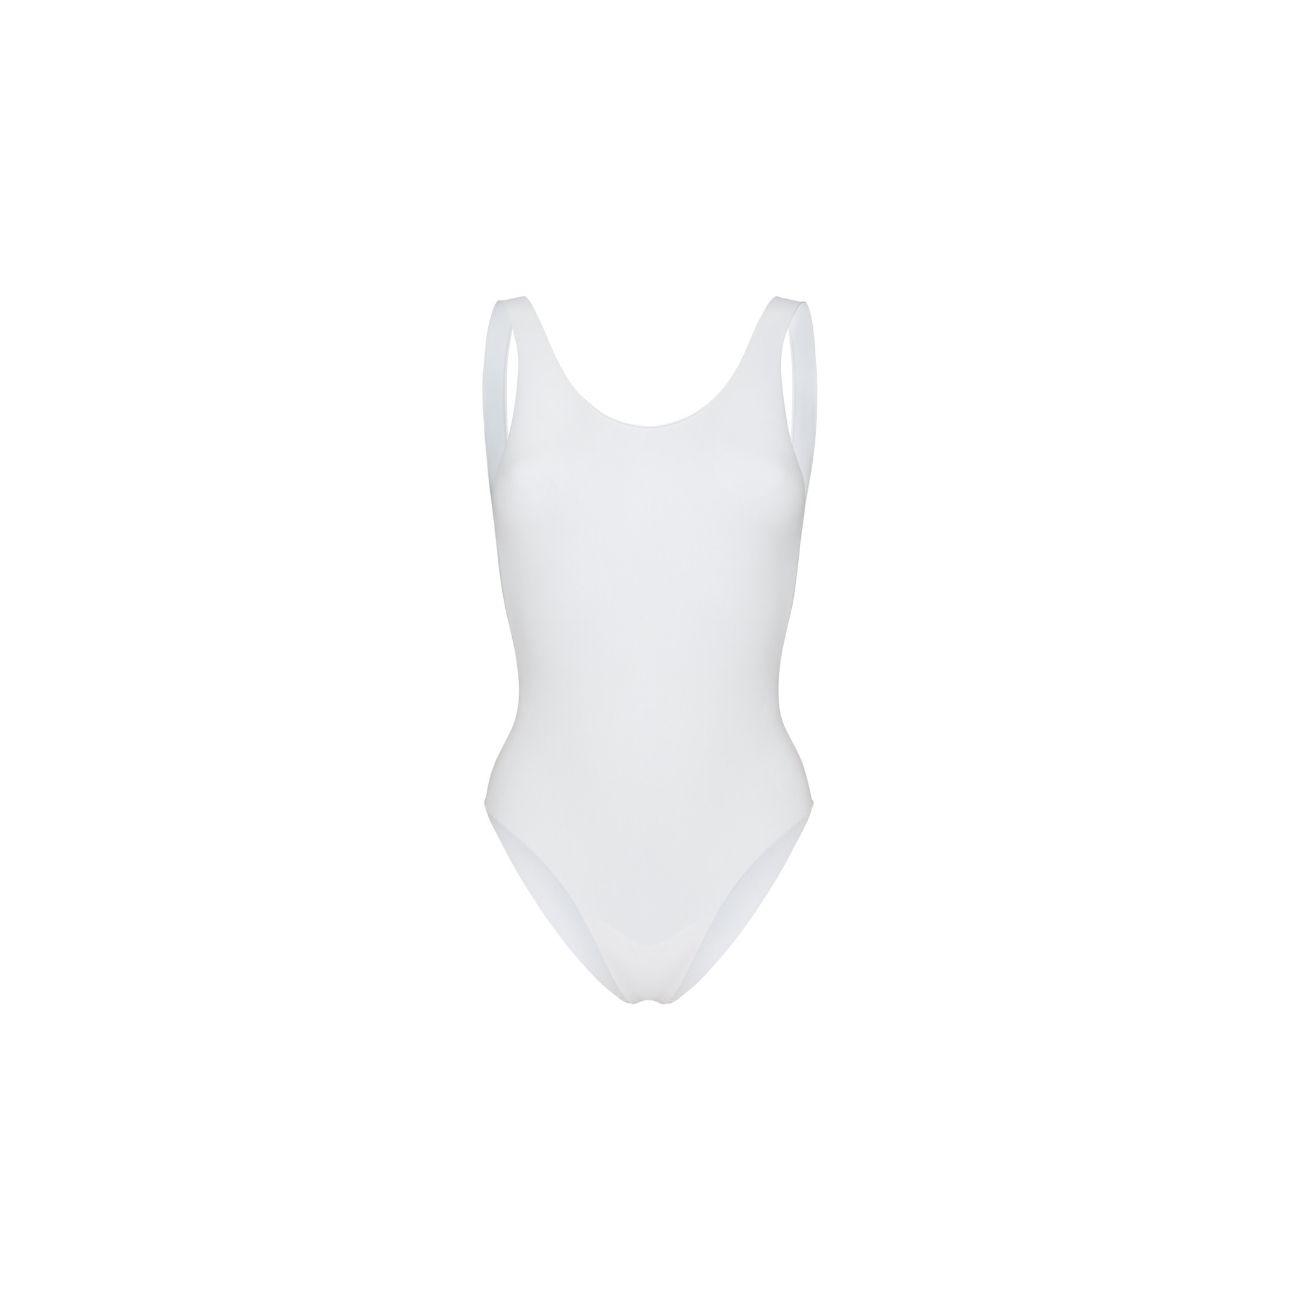 Sport Angel women's south carolina white bodysuit